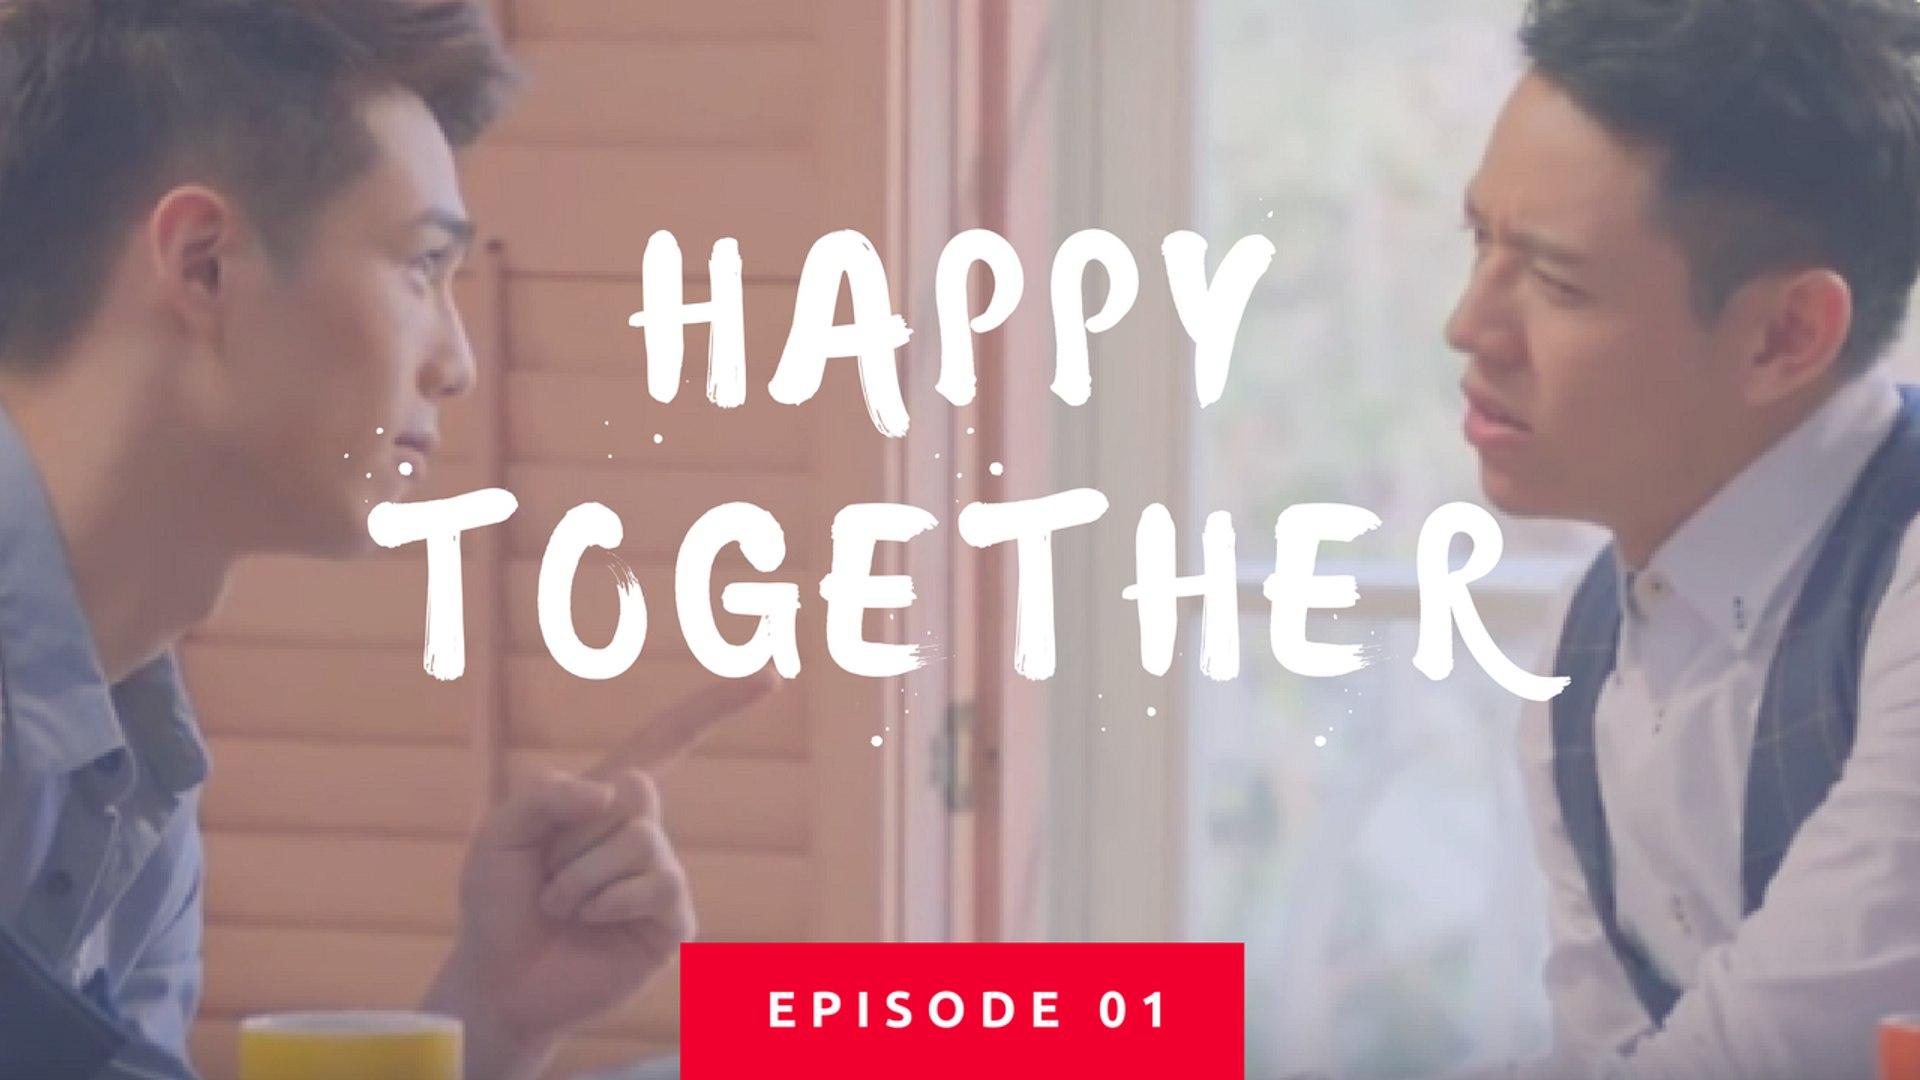 Happy Together Alex Benny Ep 01 English Sub Video Dailymotion